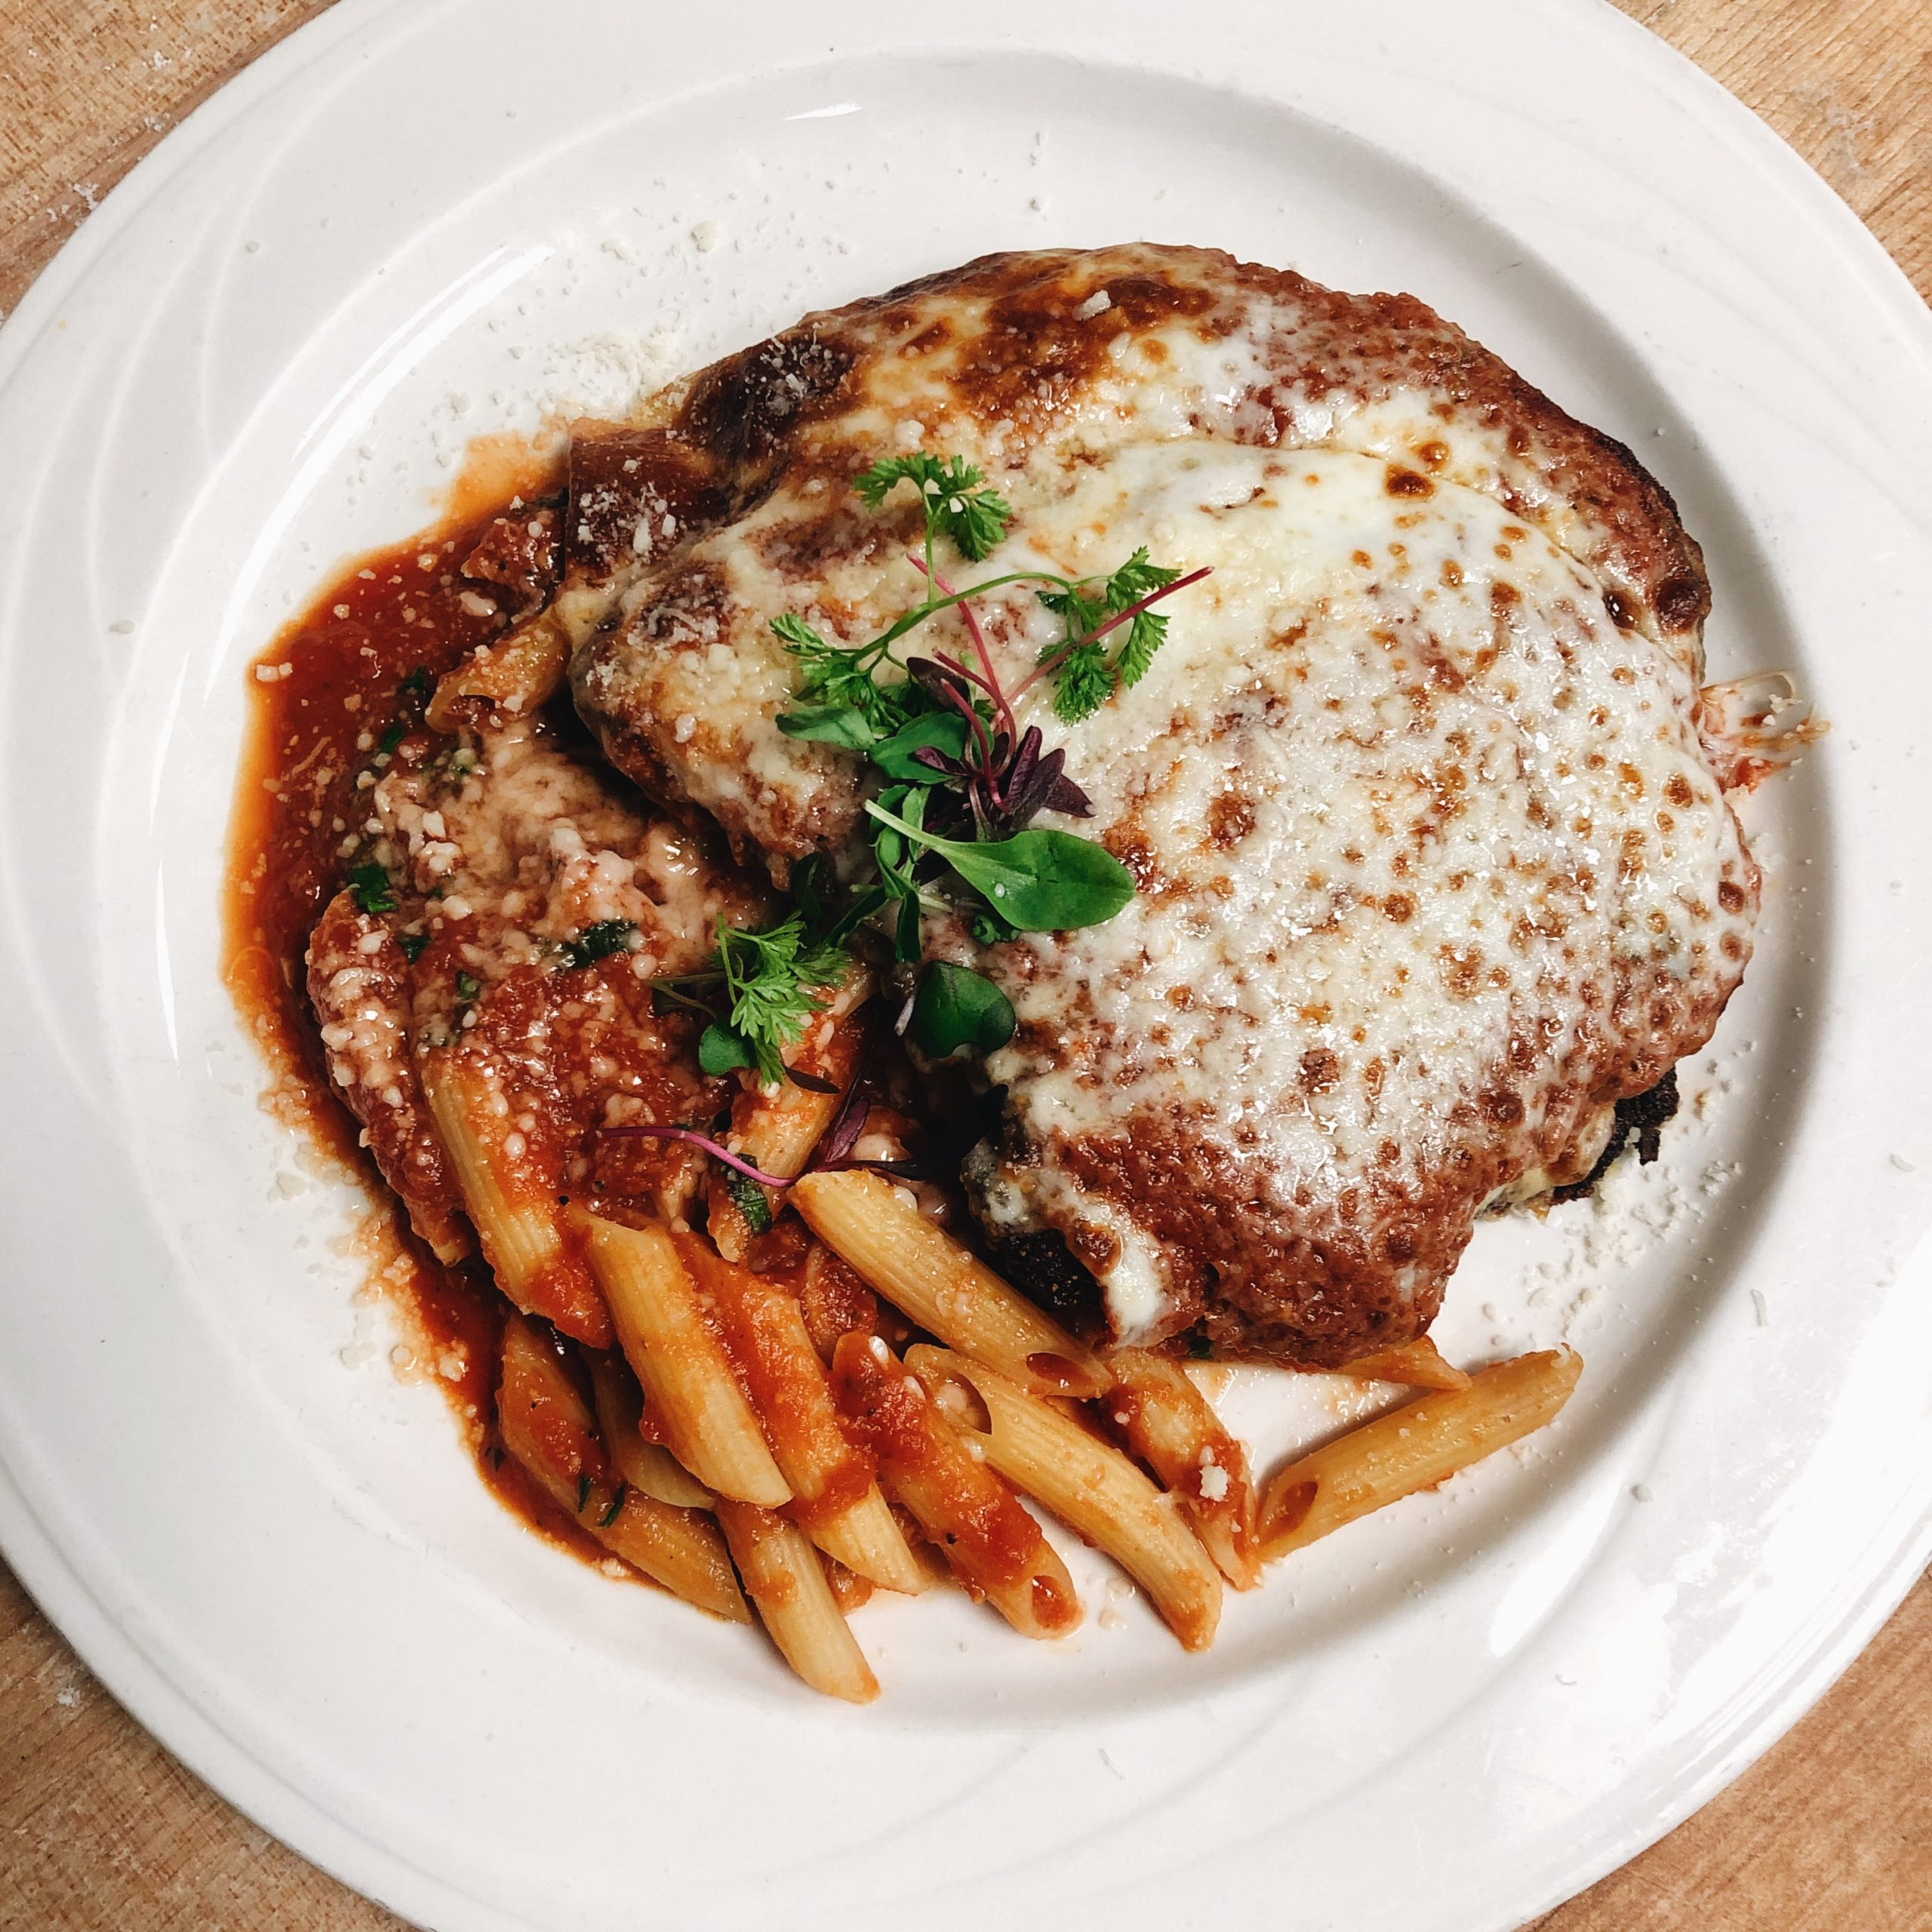 Breaded Chicken Breast, mozzarella cheese, penne pasta, marinara sauce.